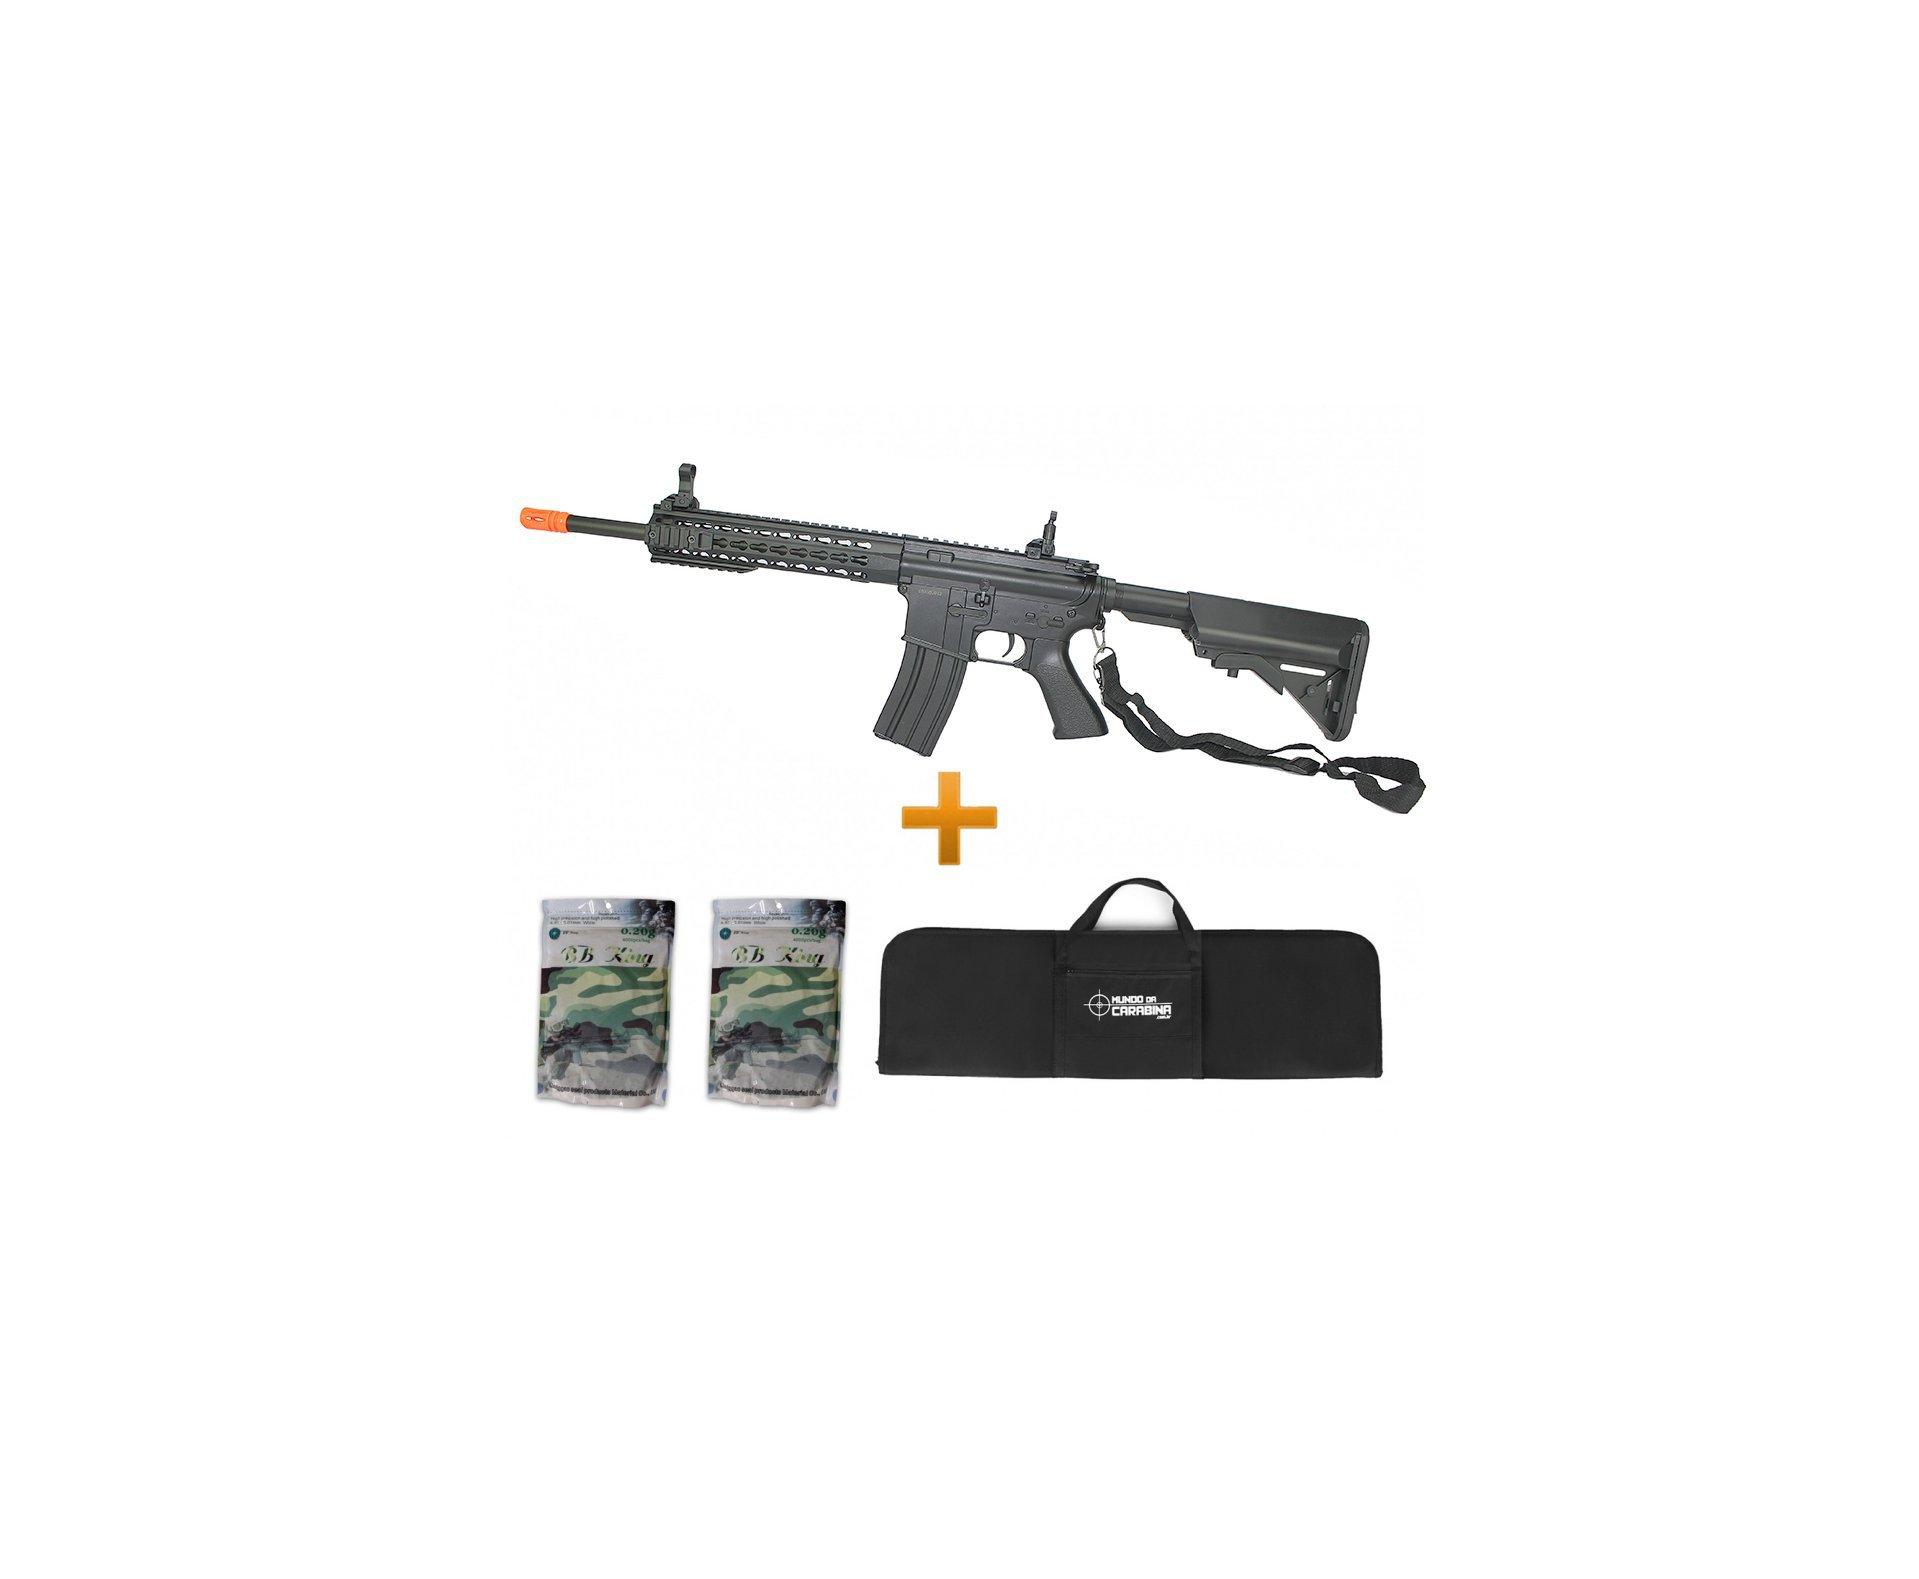 Rifle De Airsoft M4a1 Ris Black Cal 6mm - Bivolt - Cm515 - Cyma + Capa + 8000 Bbs